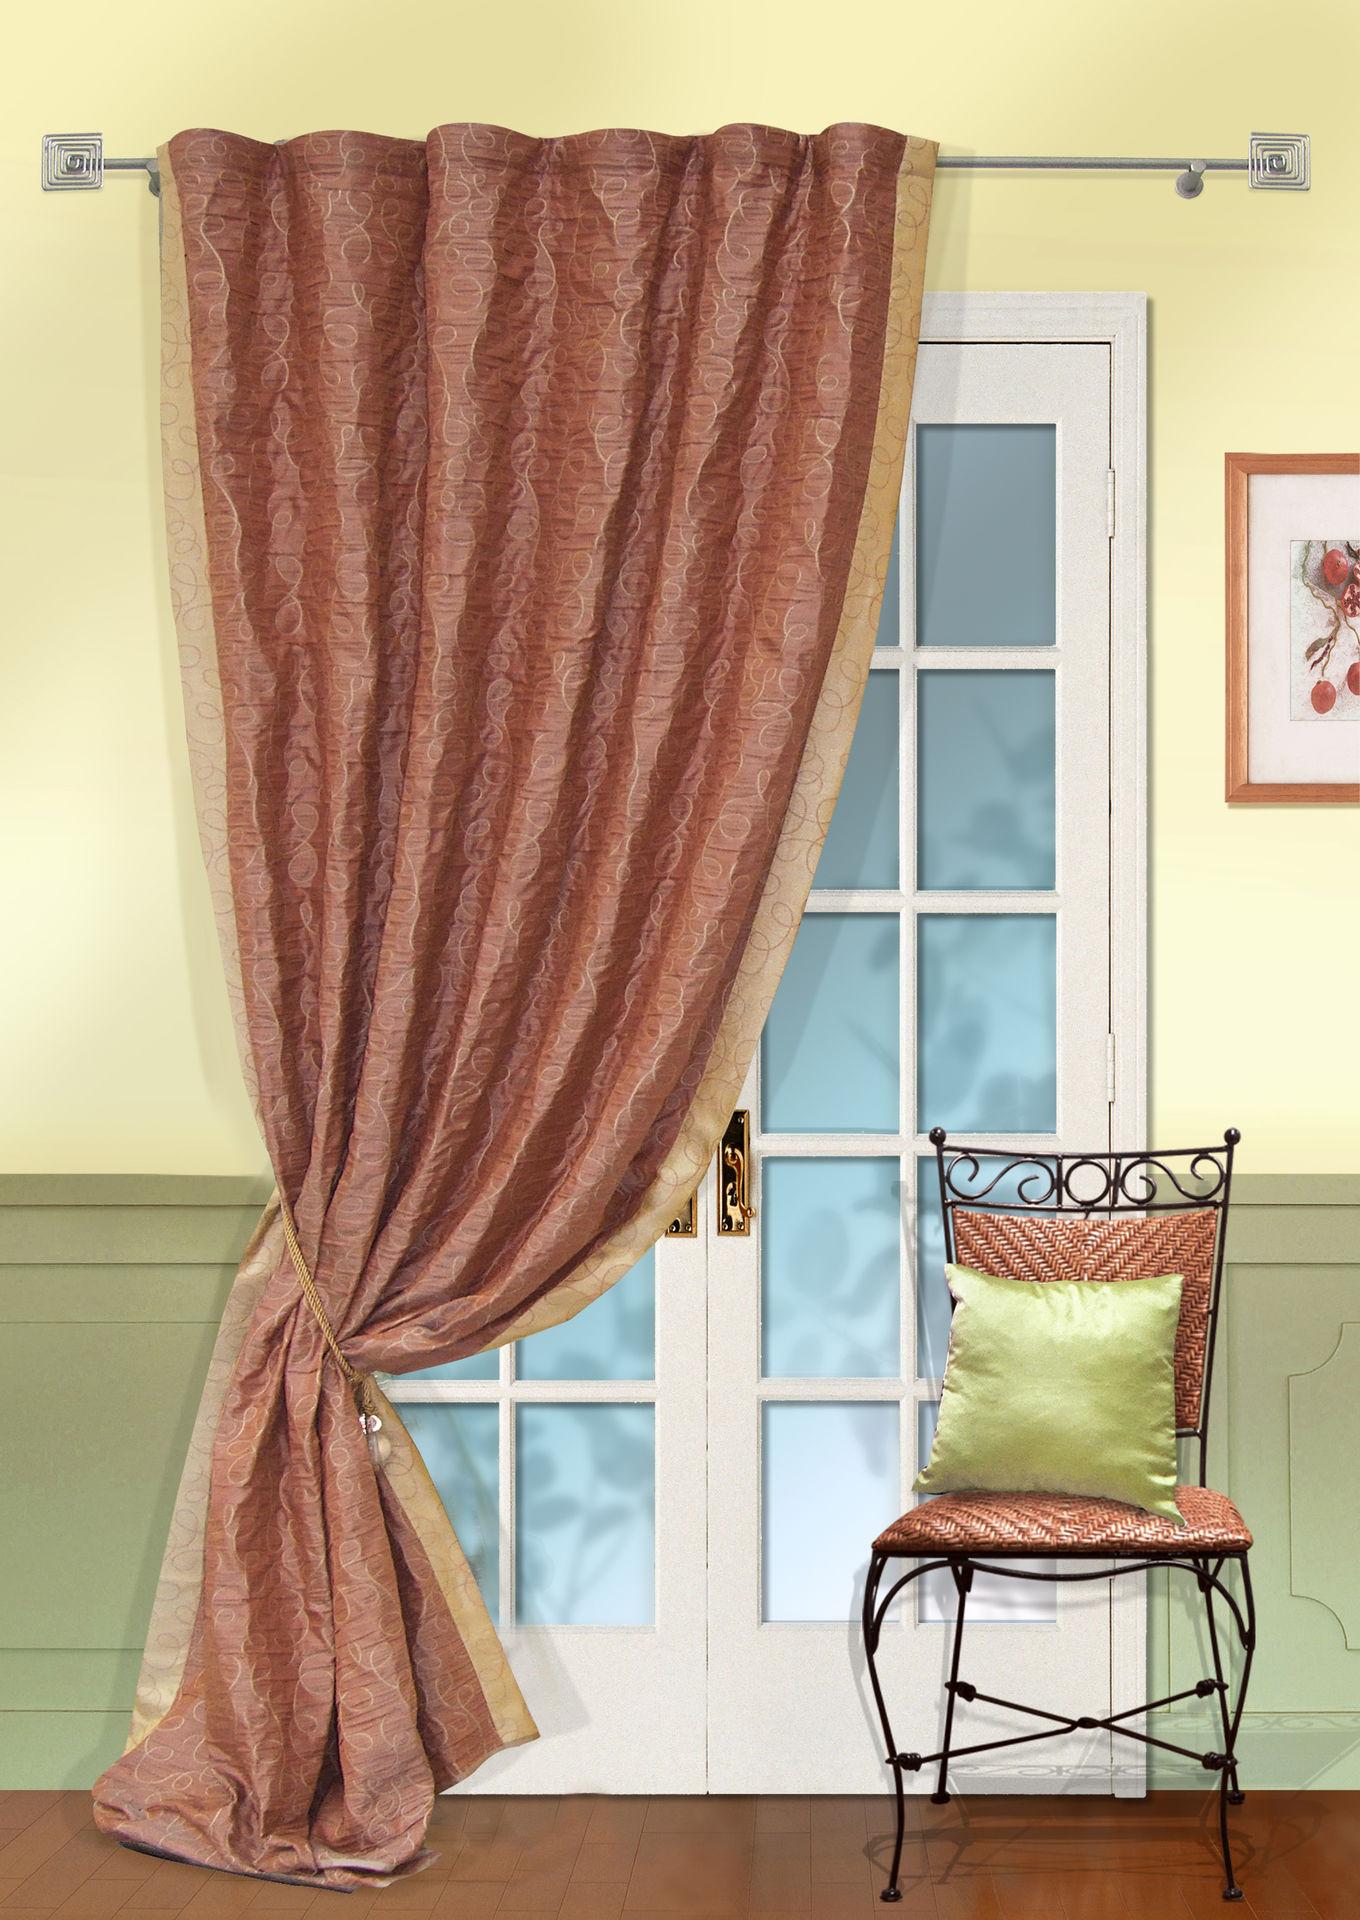 Шторы Kauffort Классические шторы Minor  -XL Цвет: Терракотовый шторы kauffort классические шторы cresh xl цвет шампань